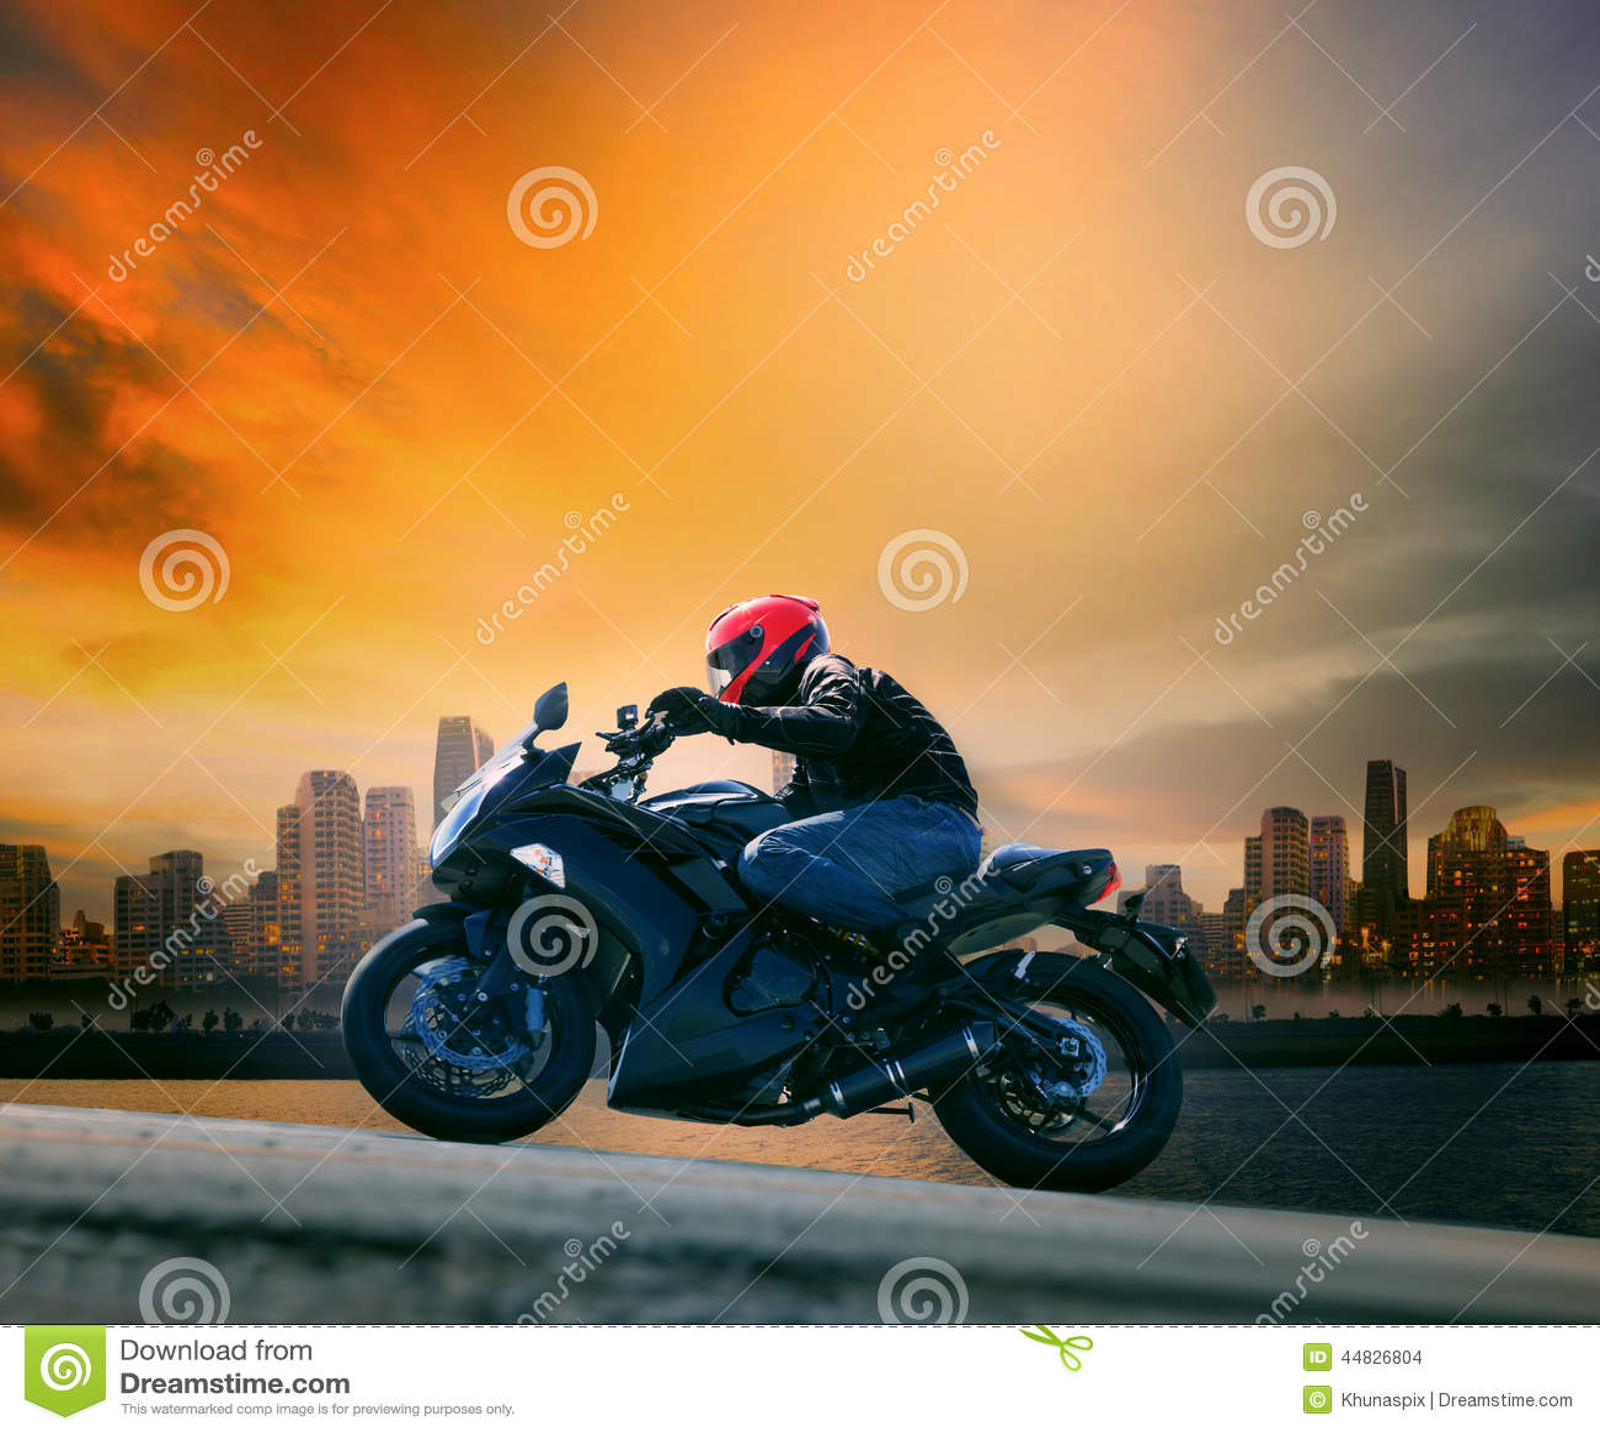 Den unga mannen och säkerhet passar rida den stora motorcykeln mot beautifu